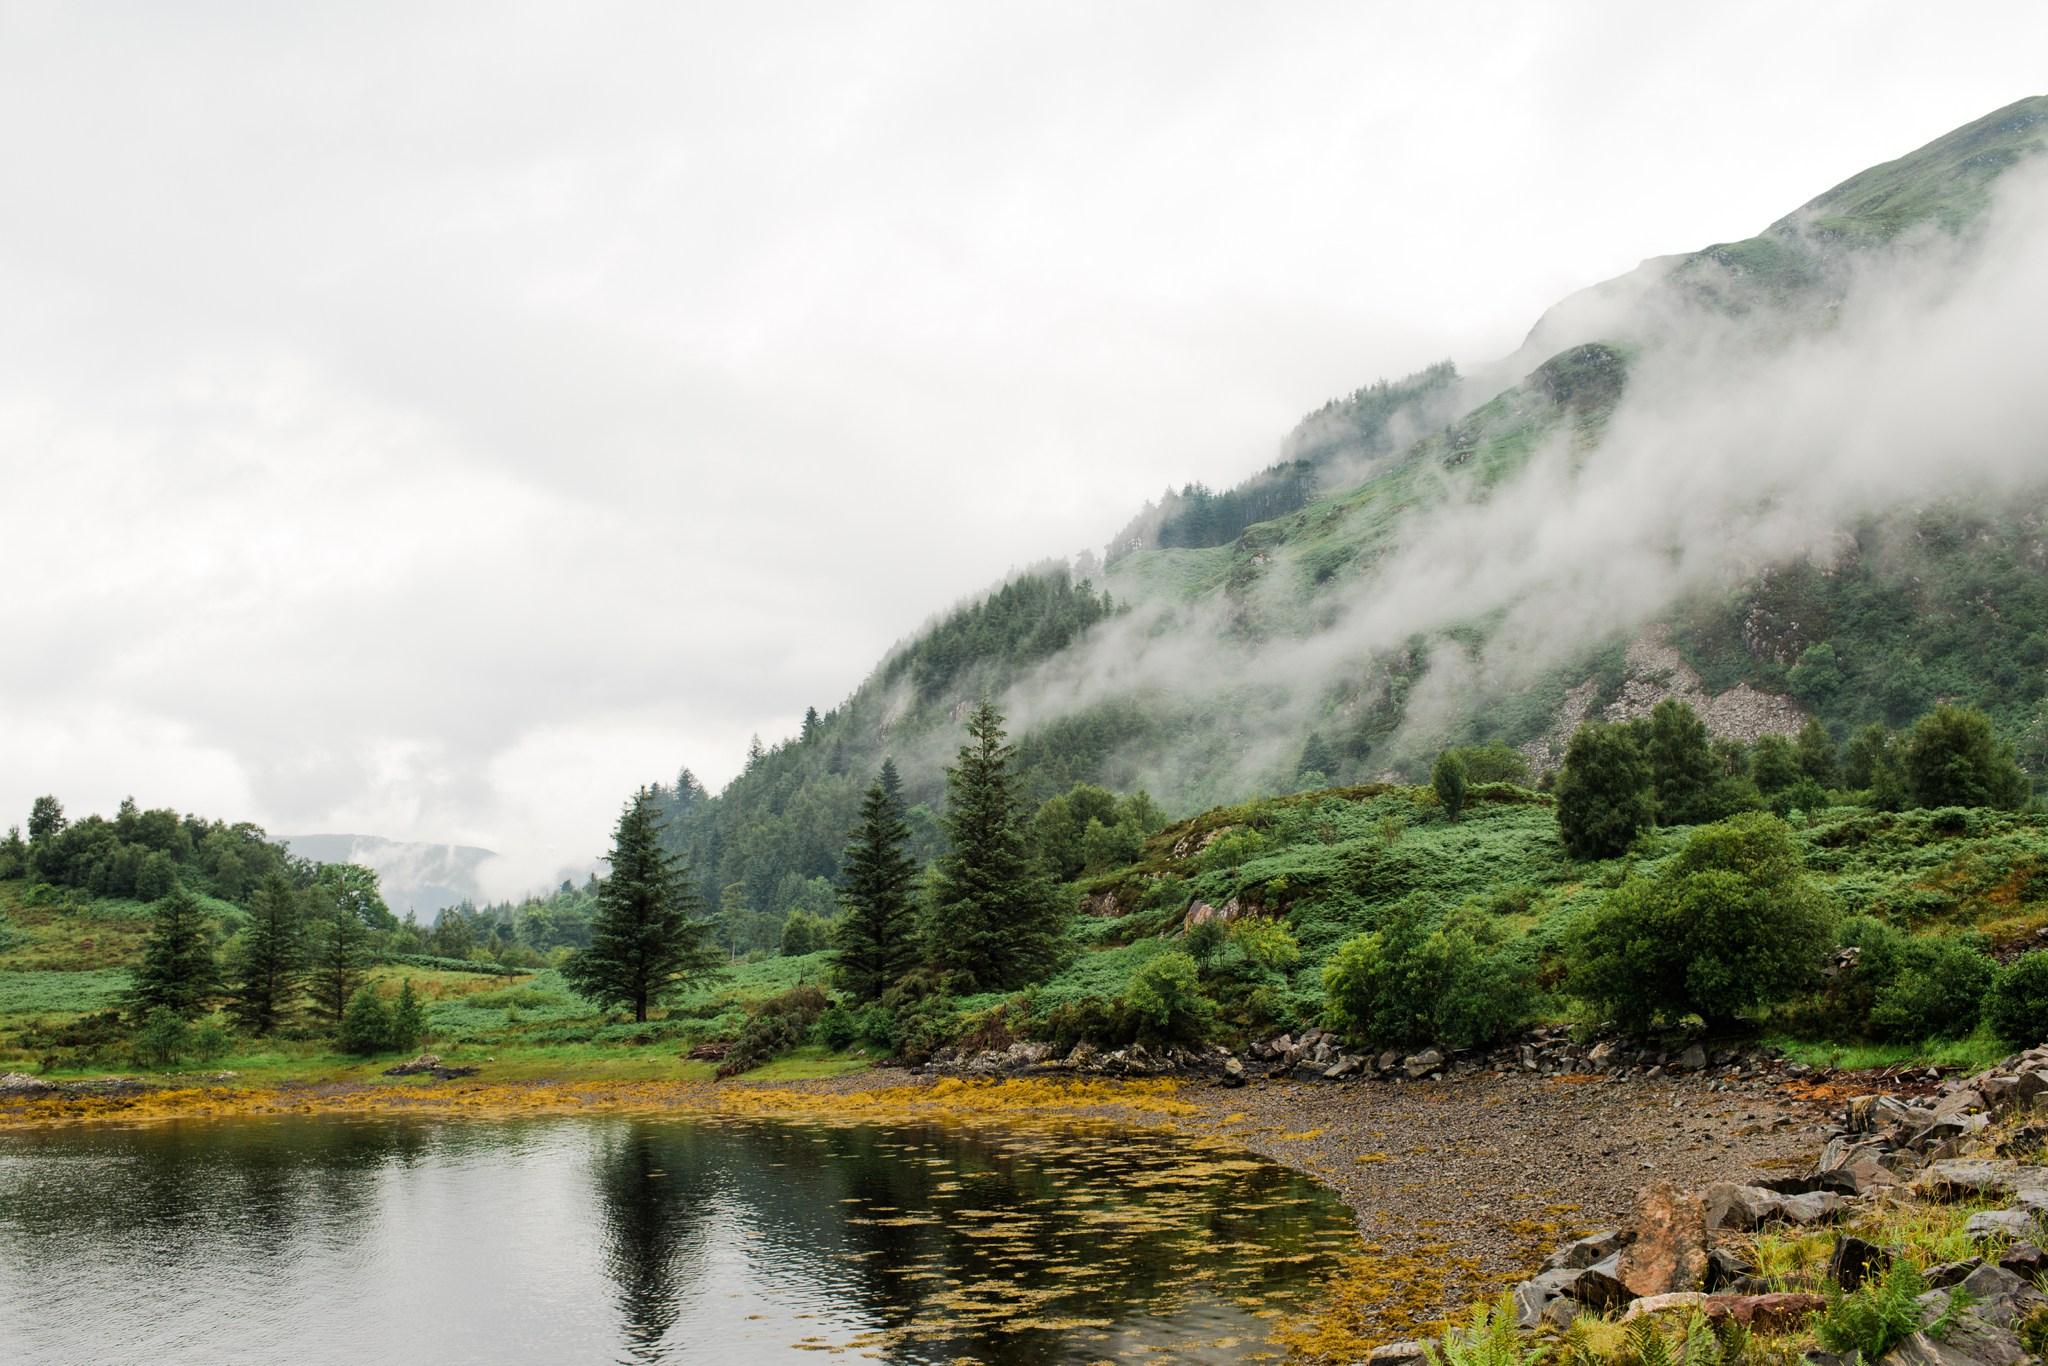 scotland_landscapes_deborah_zoe_photography_00020.JPG